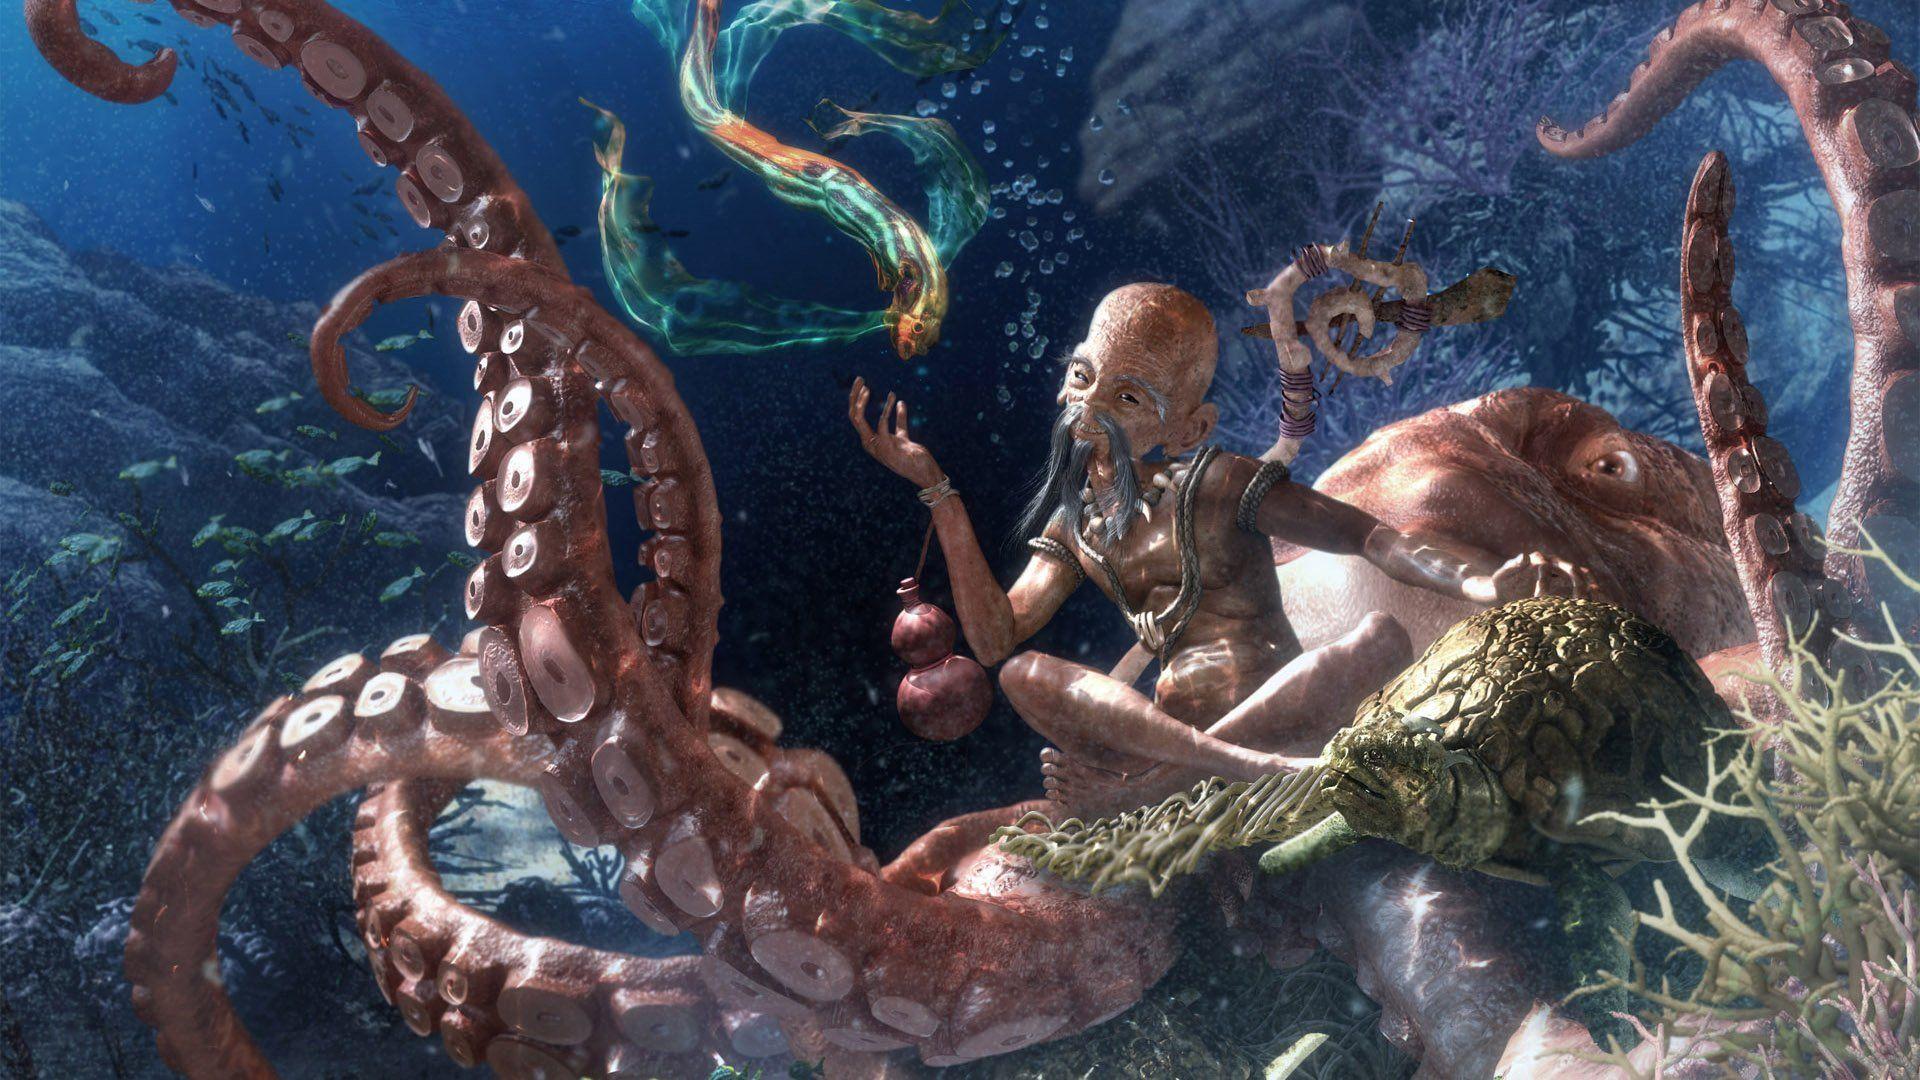 Octopus Wallpaper » WallDevil - Best desktop and mobile wallpapers